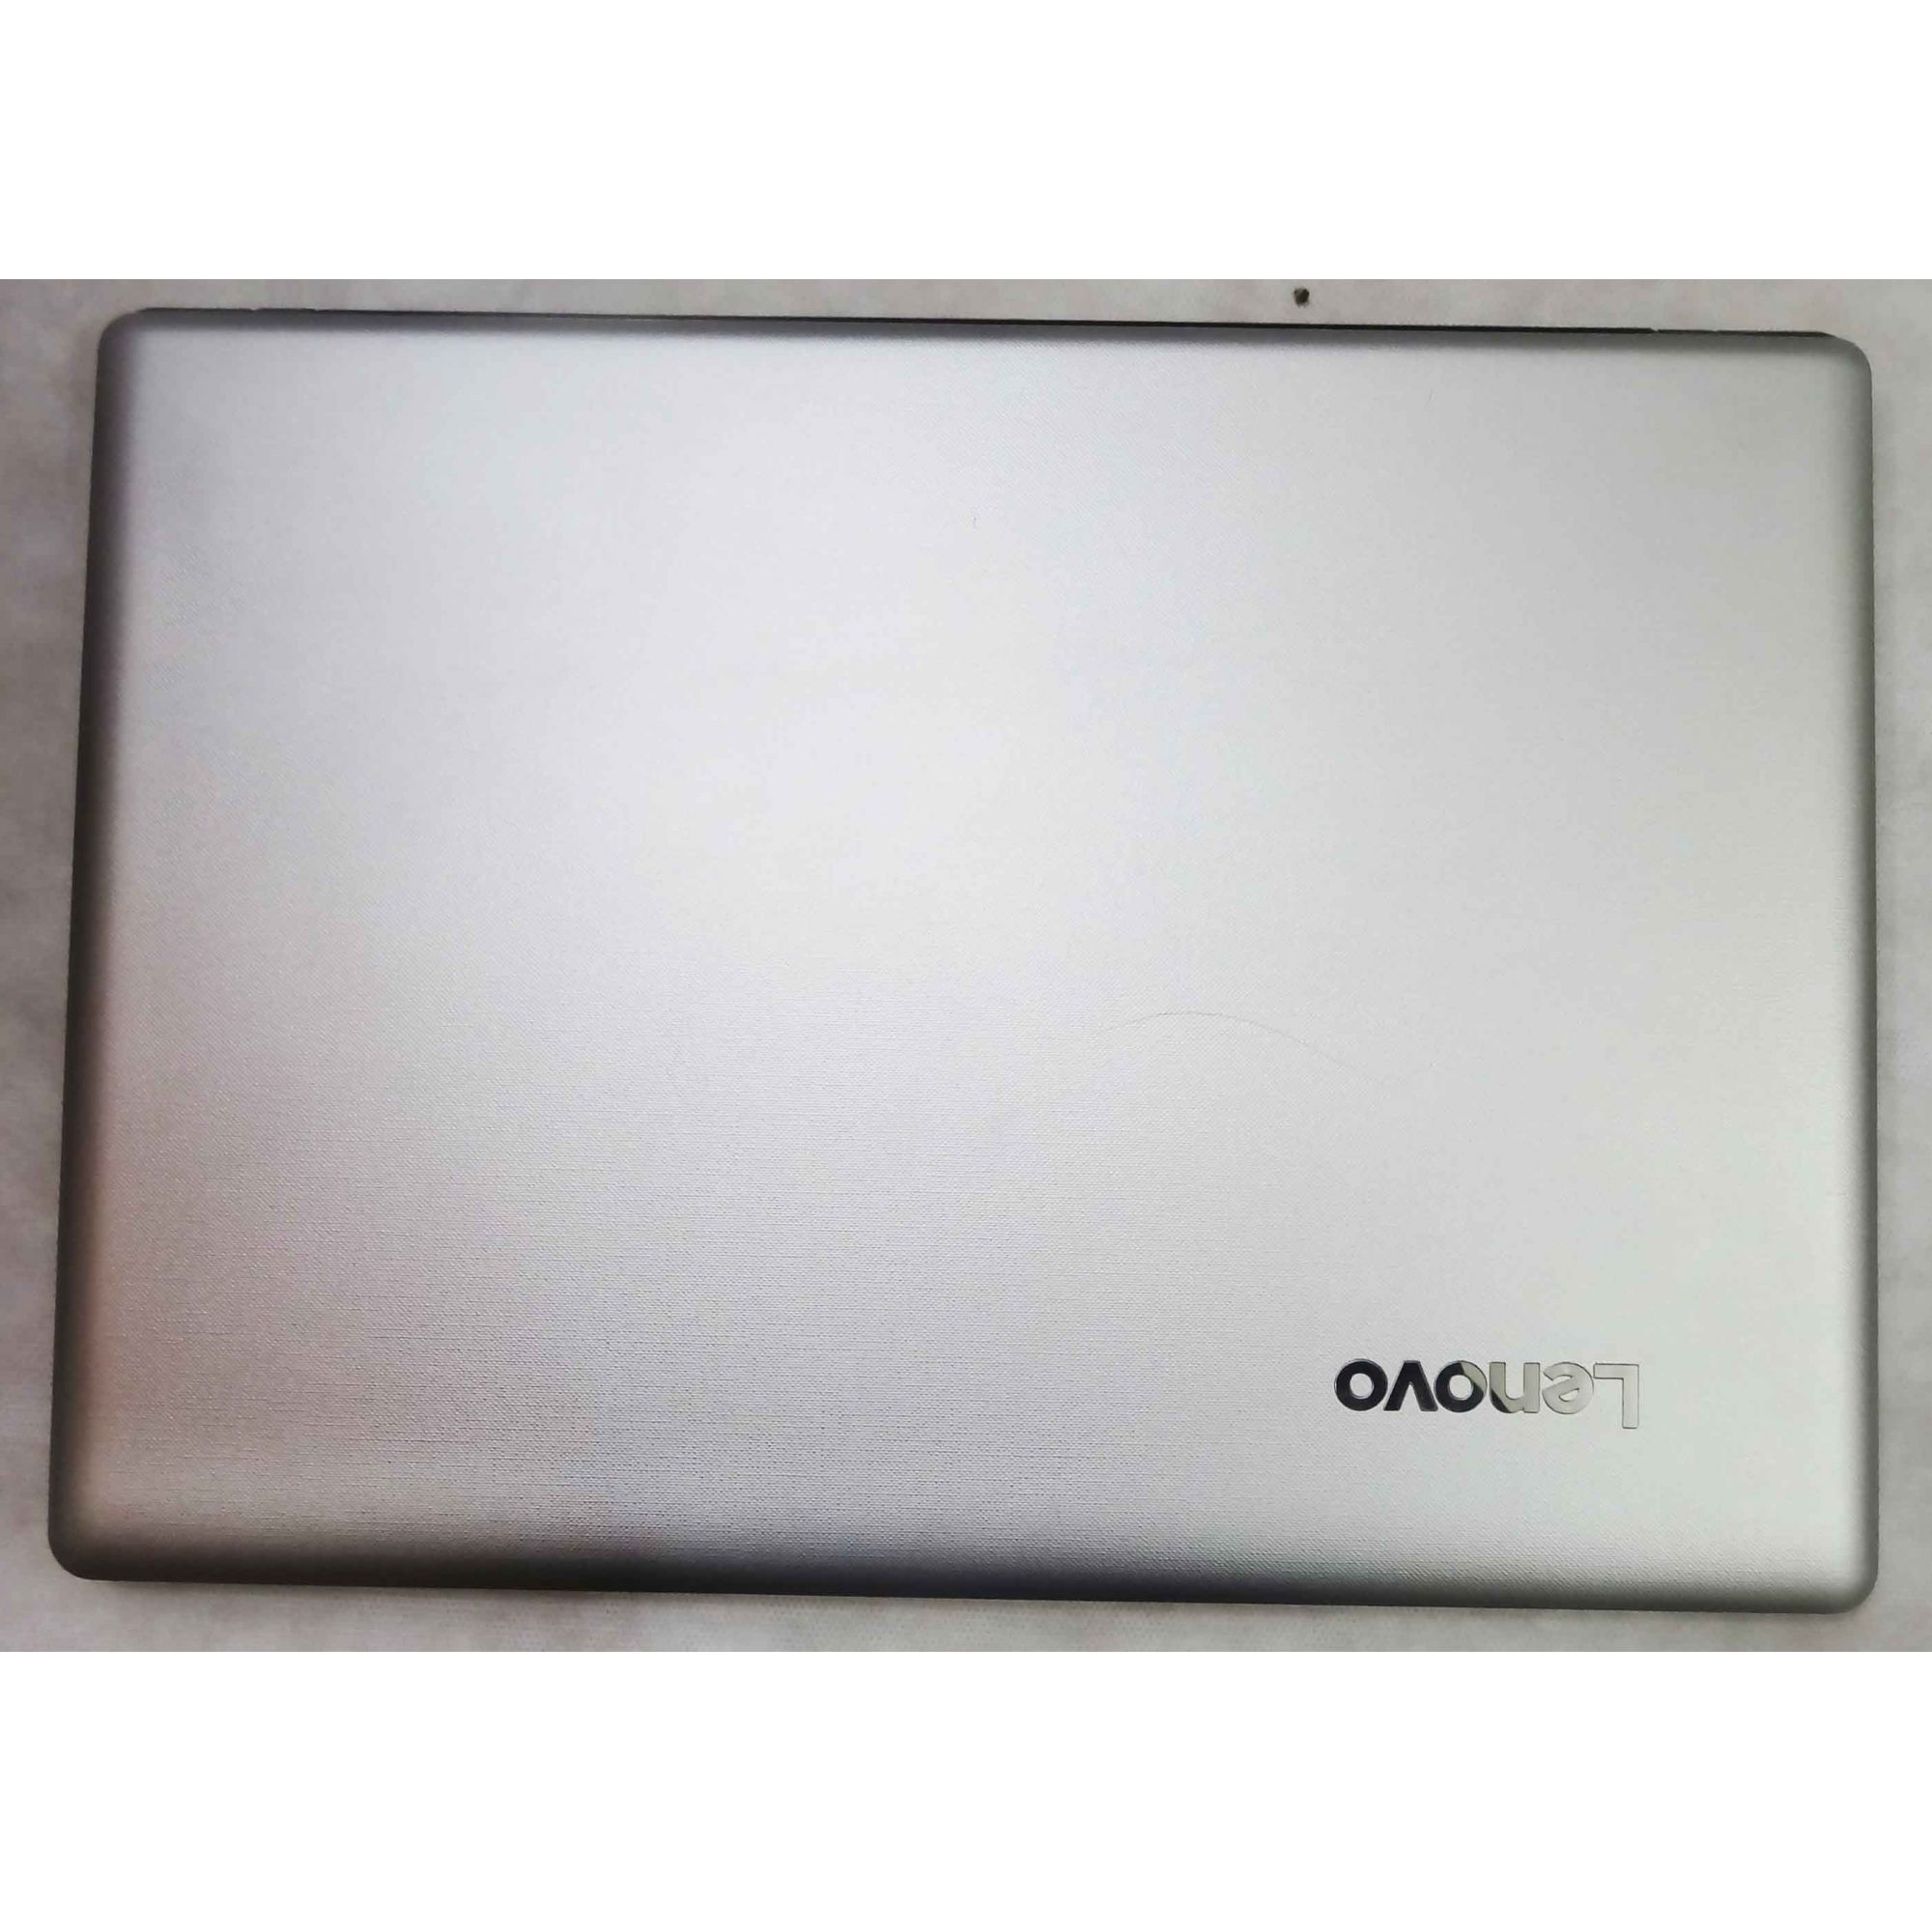 Notebook Lenovo Ideapad 110 14'' Intel Cel Dual Core 1.6GHz 4GB HD-500GB